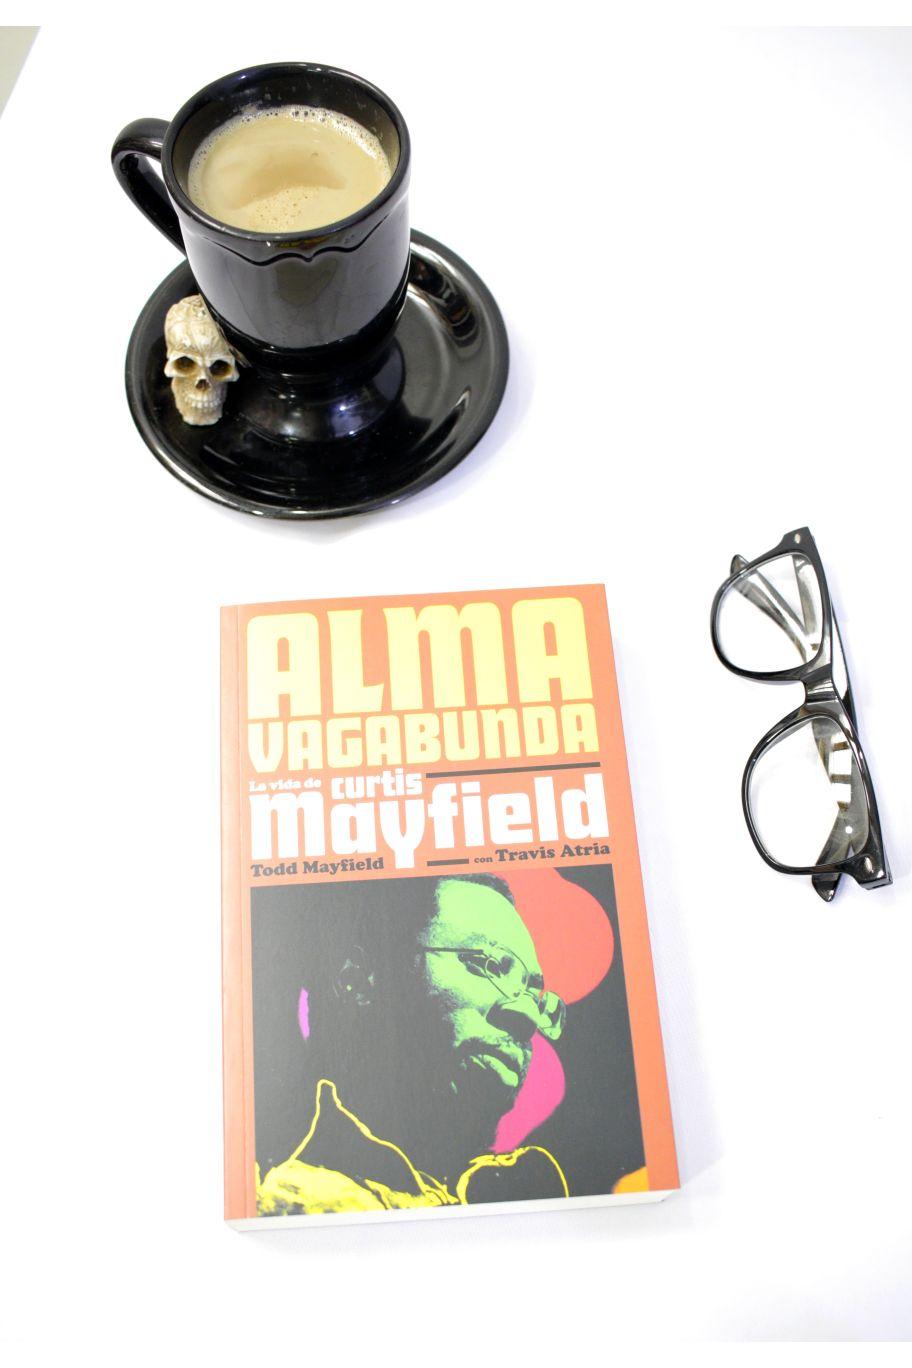 ALMA VAGABUNDA, TOD MAYFIELD: TRAVIS ATRIA